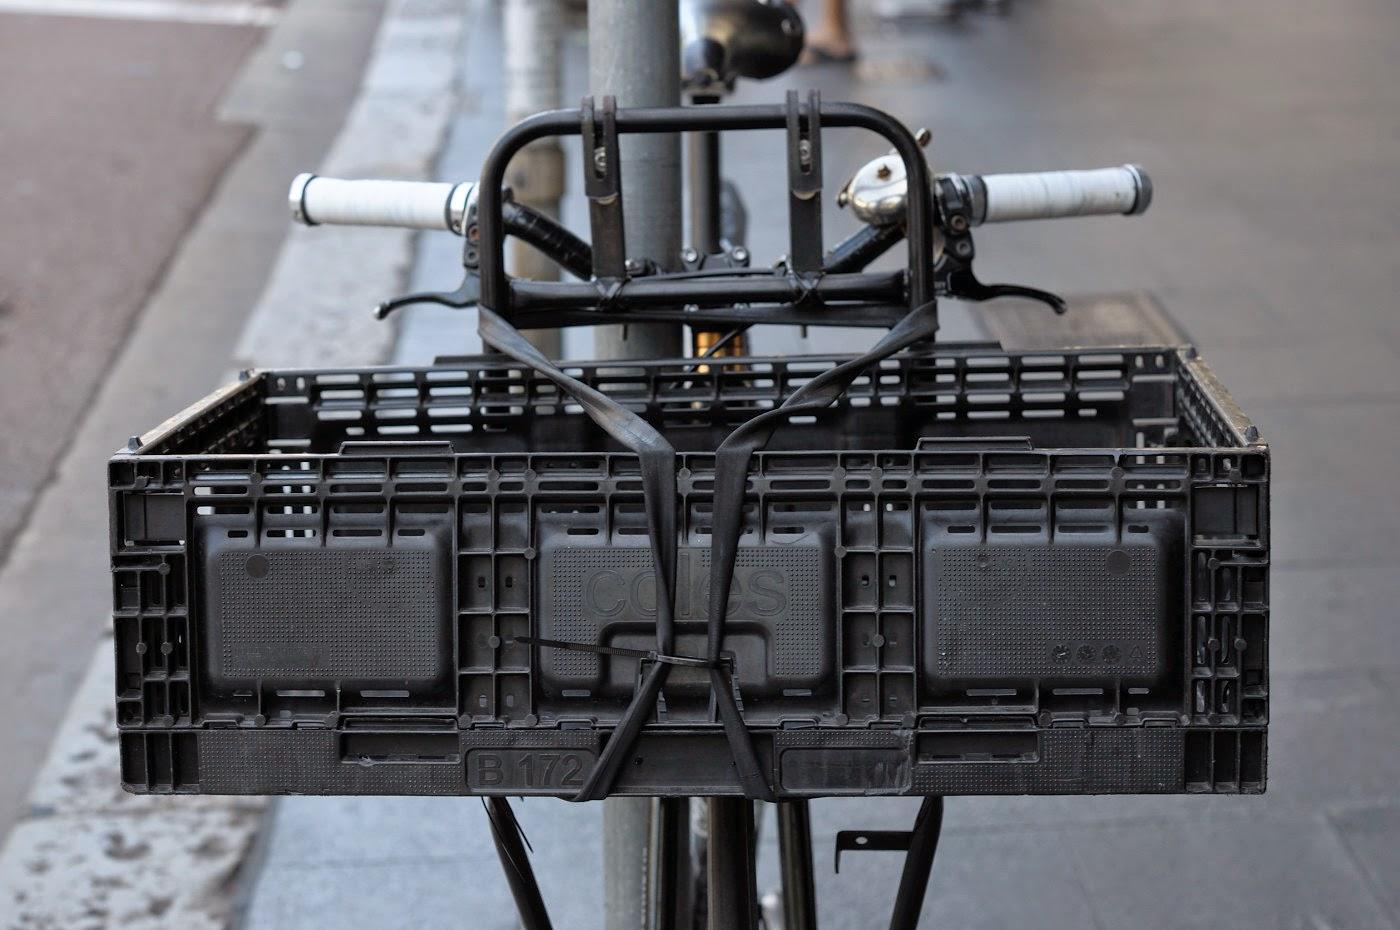 The Biketorialist, tim Macauley, bespoke, custom, bicycle, bike, street, style, the light monkey collective, Sydney,  Australia, respoke, track frame, internally geared, internal hub, strada pro model, courier bike, front basket,